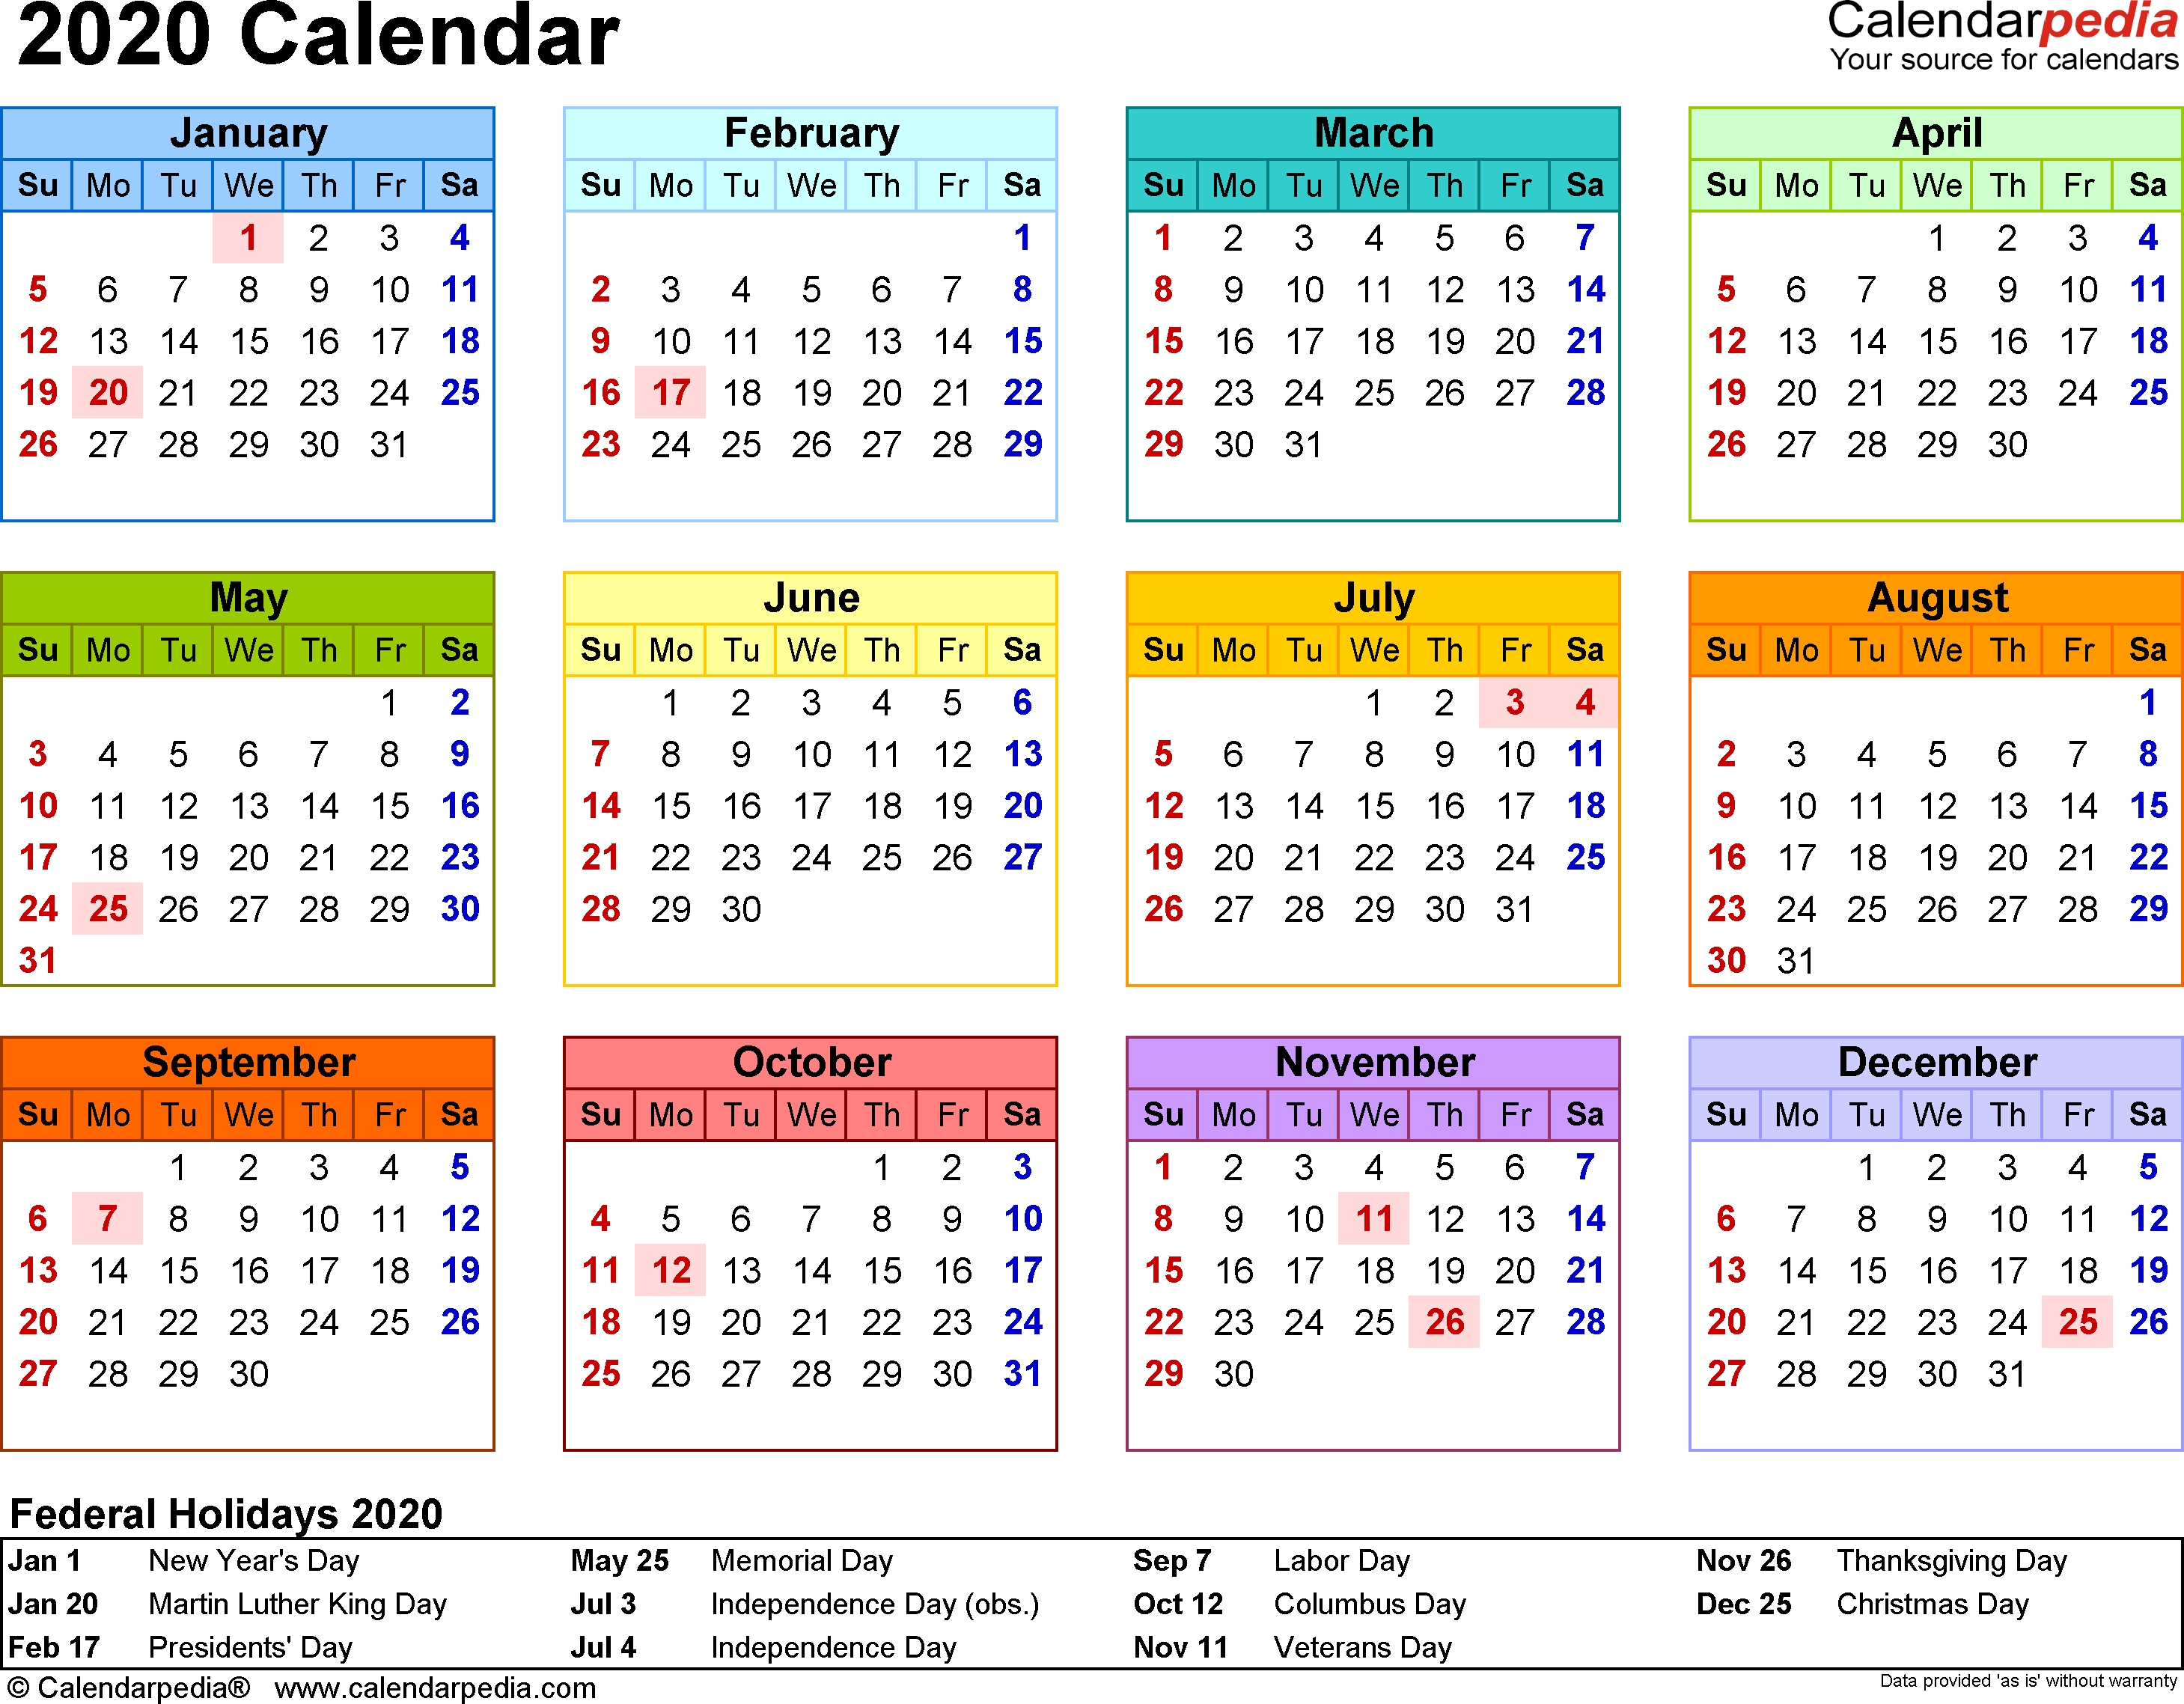 2020 Calendar Pdf - 17 Free Printable Calendar Templates with Free 2020 Printable Calendars Without Downloading